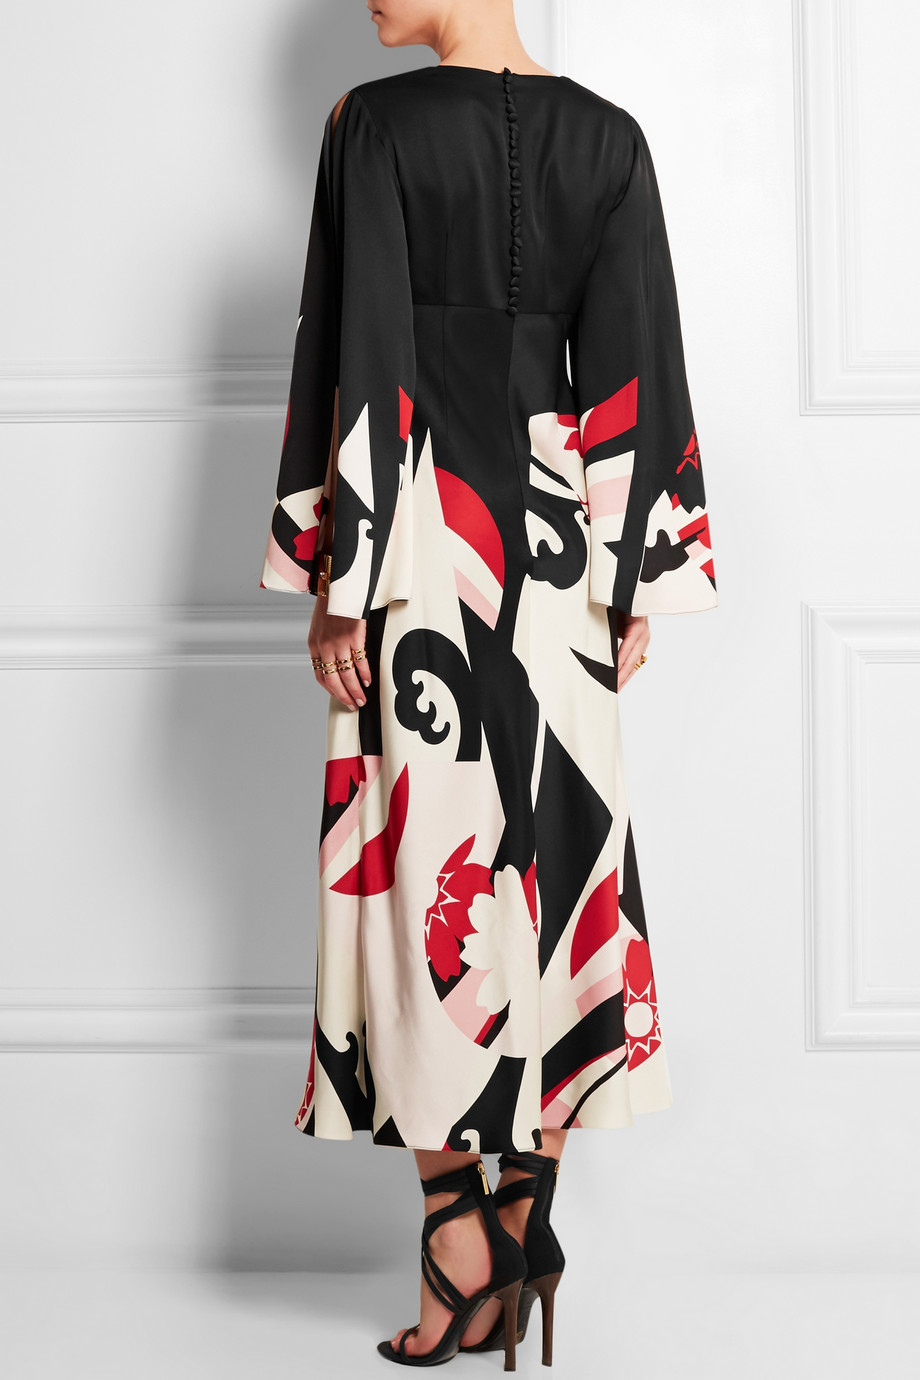 Alexander McQueen Silk Long Dress in Black